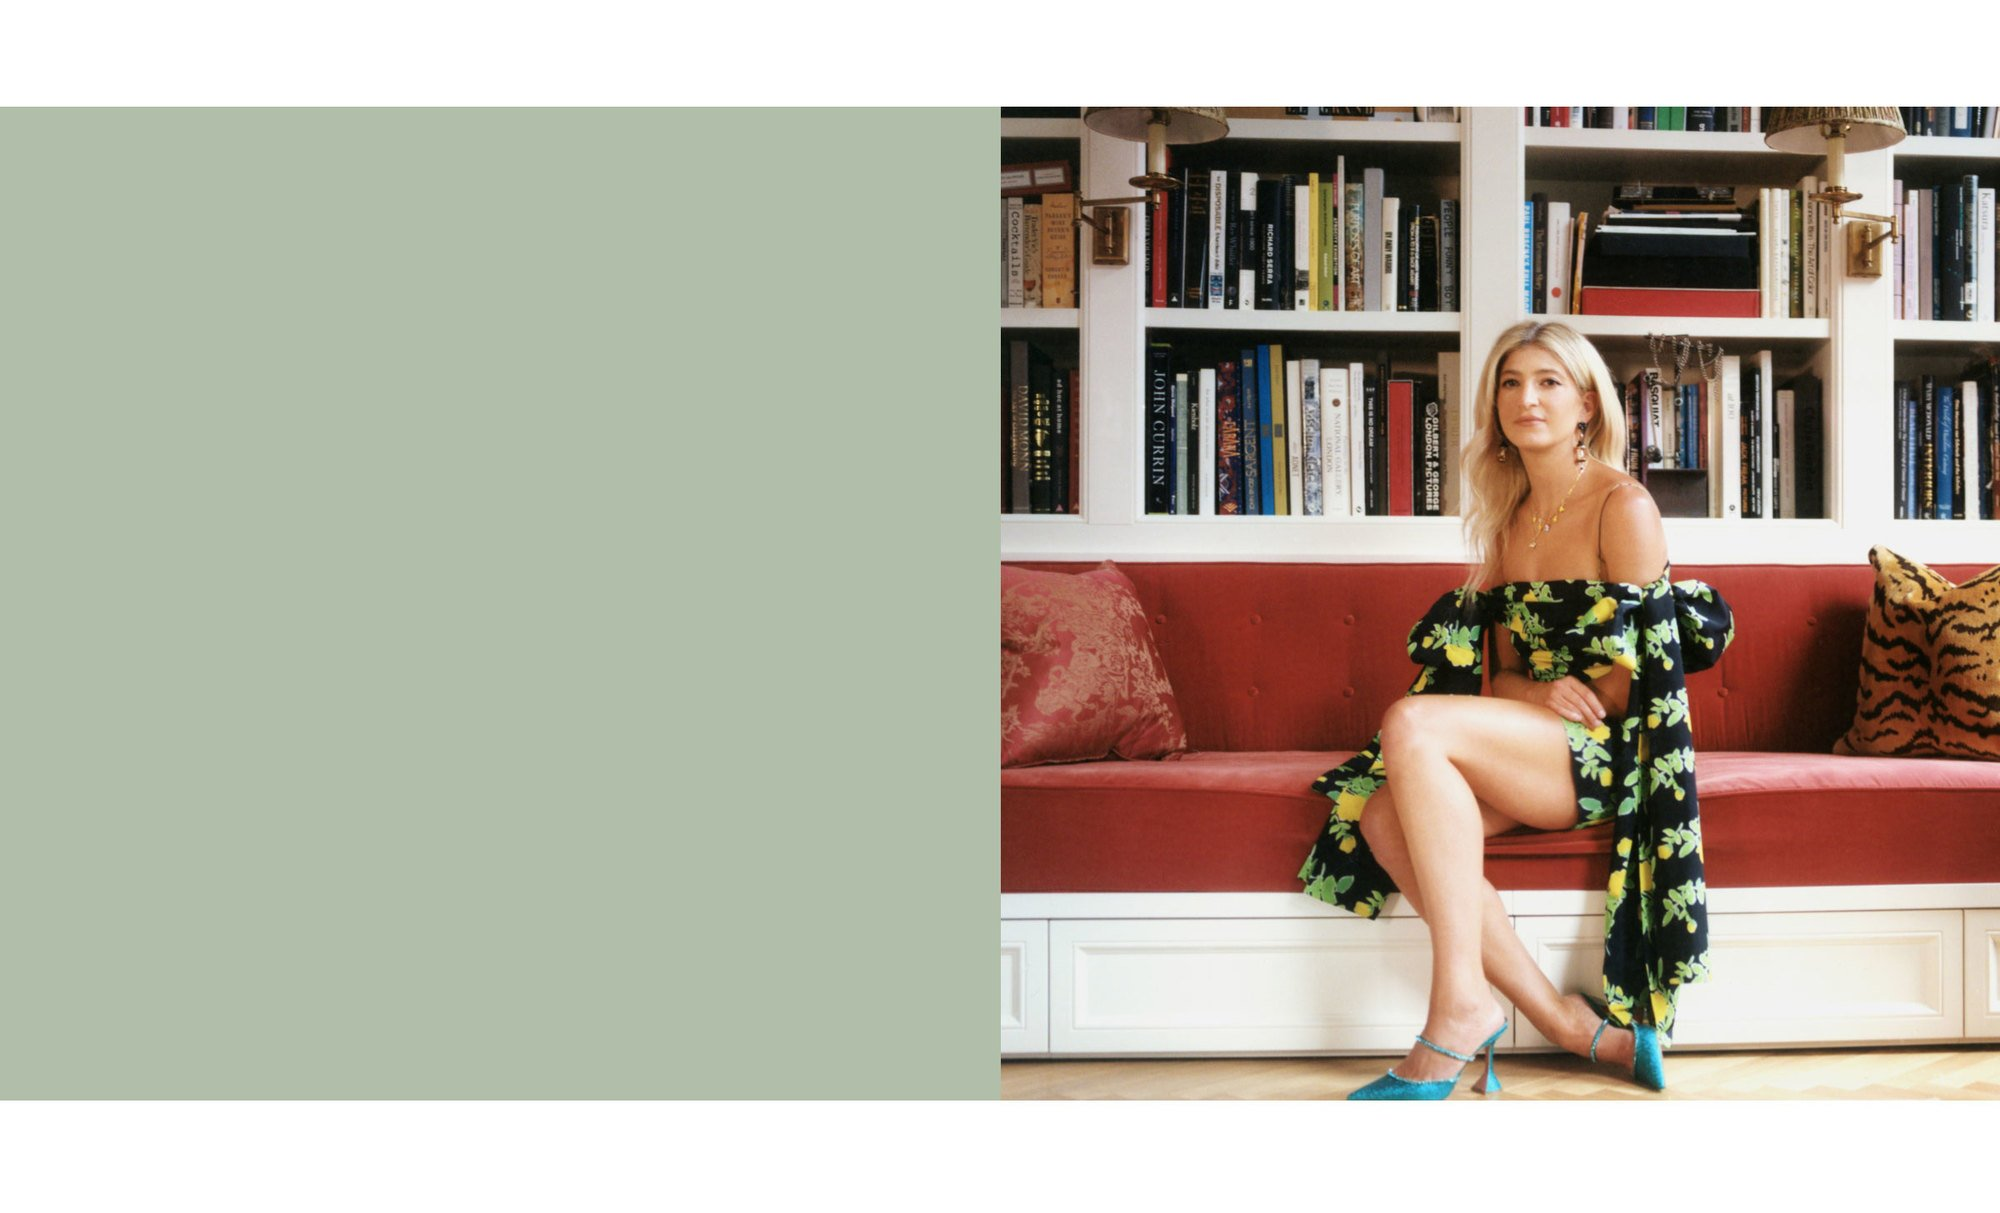 Sarah Hoover sitting in her home in a Bernadette Antwerp dress